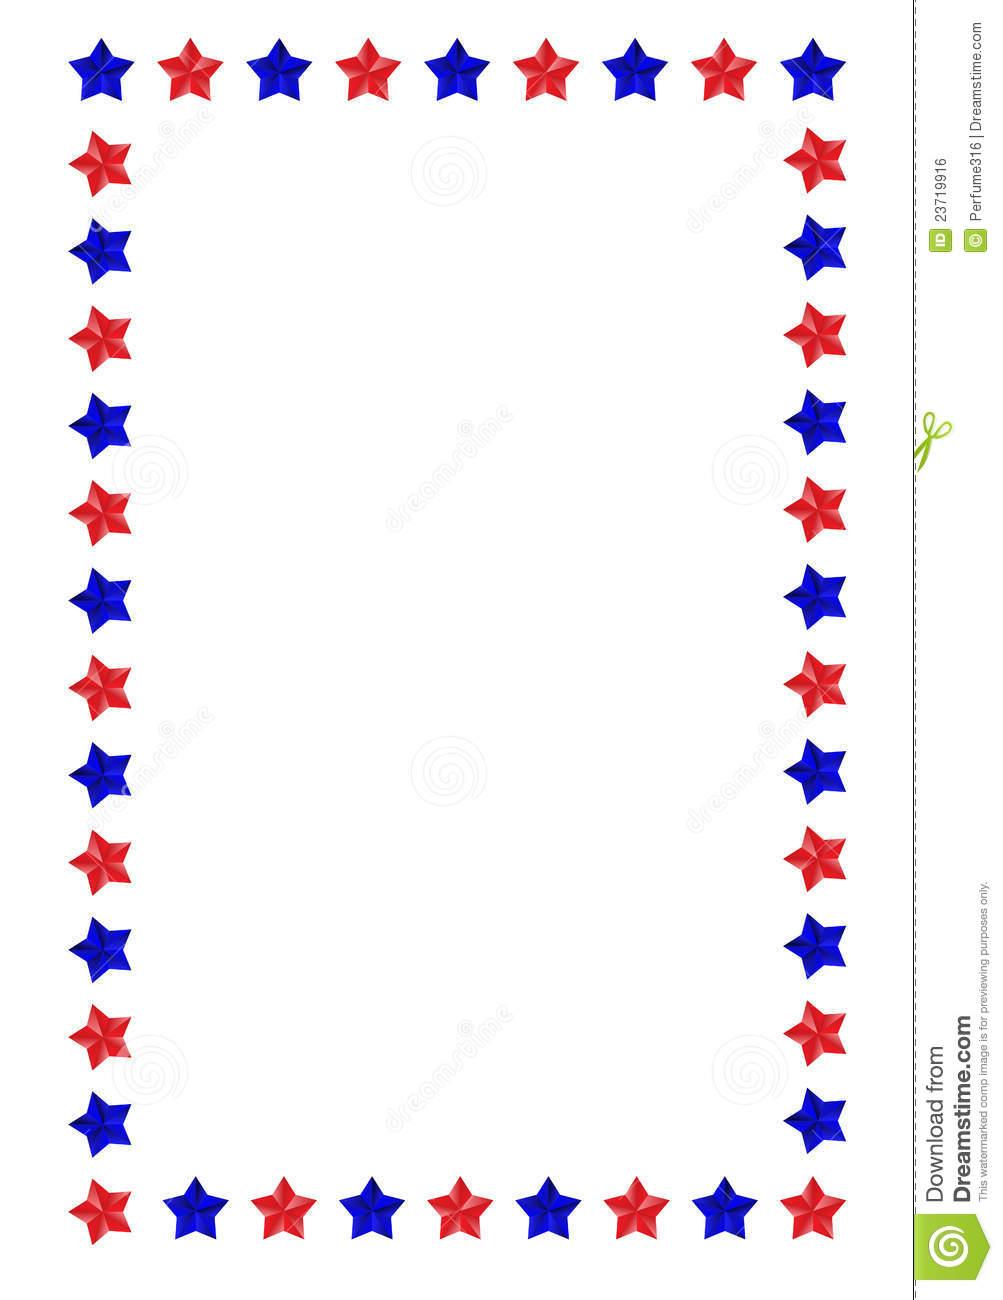 1003x1300 Clipart Star Borders